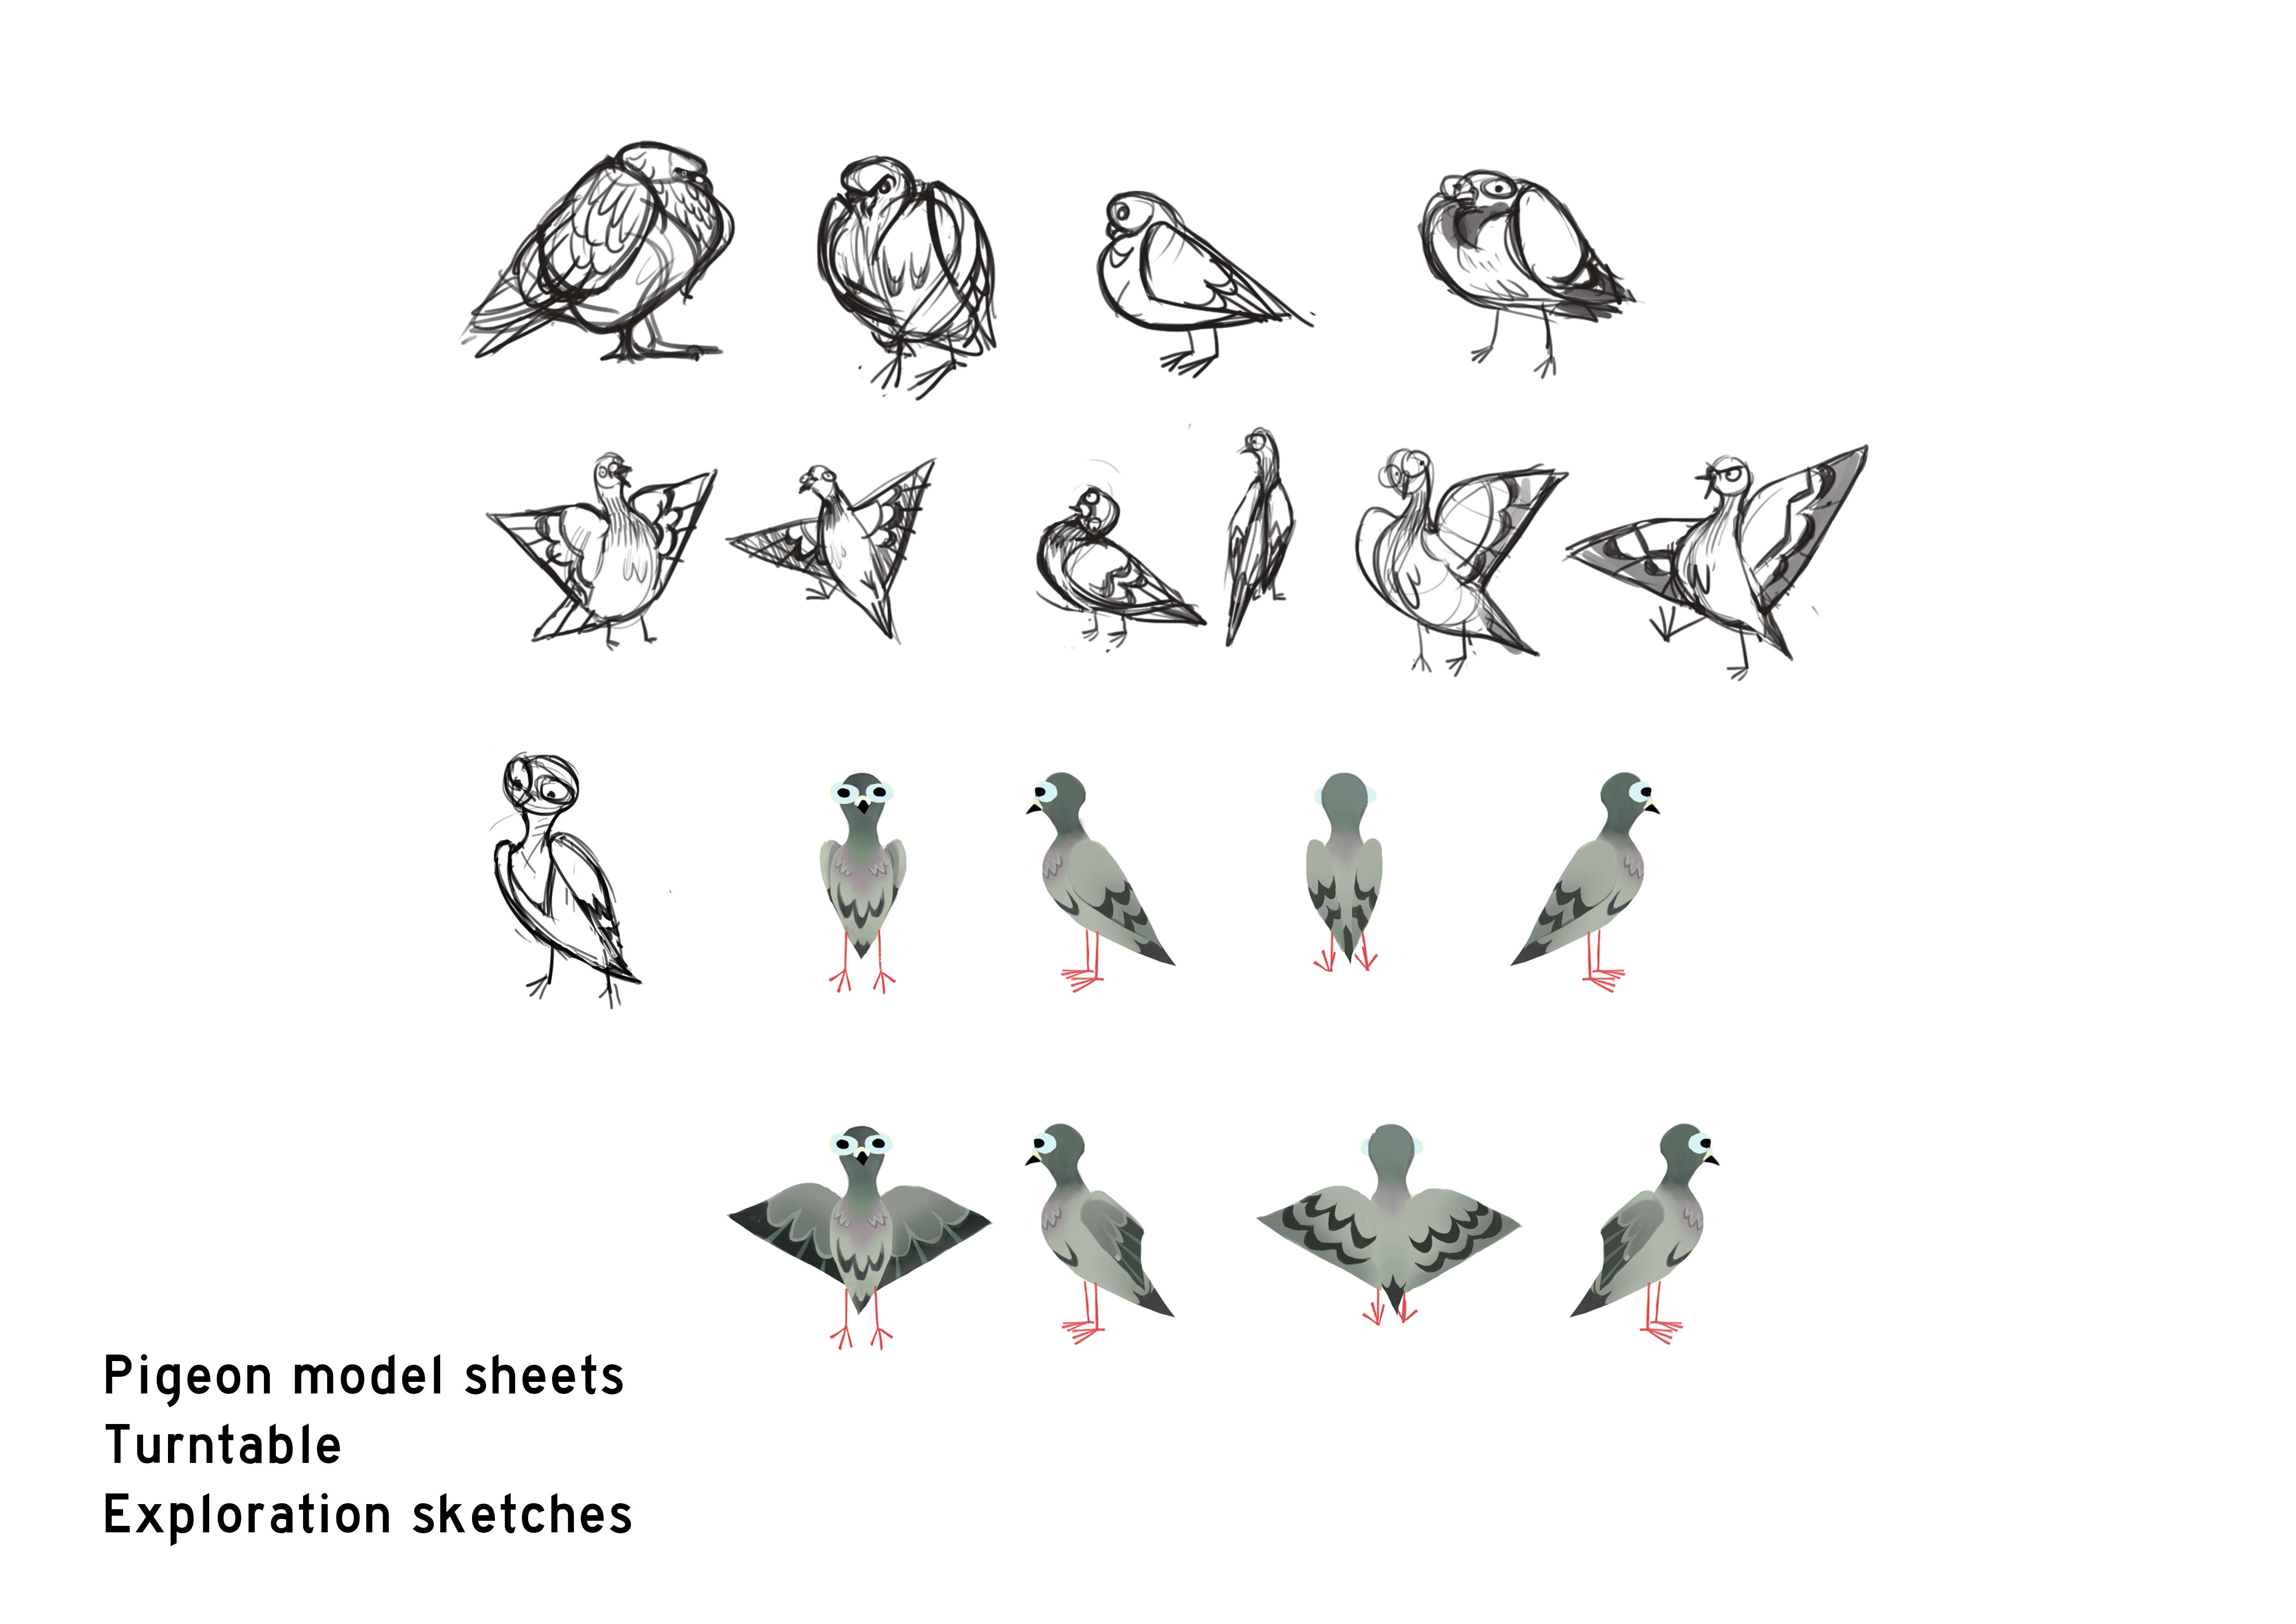 pigeon_modelsheets.jpg